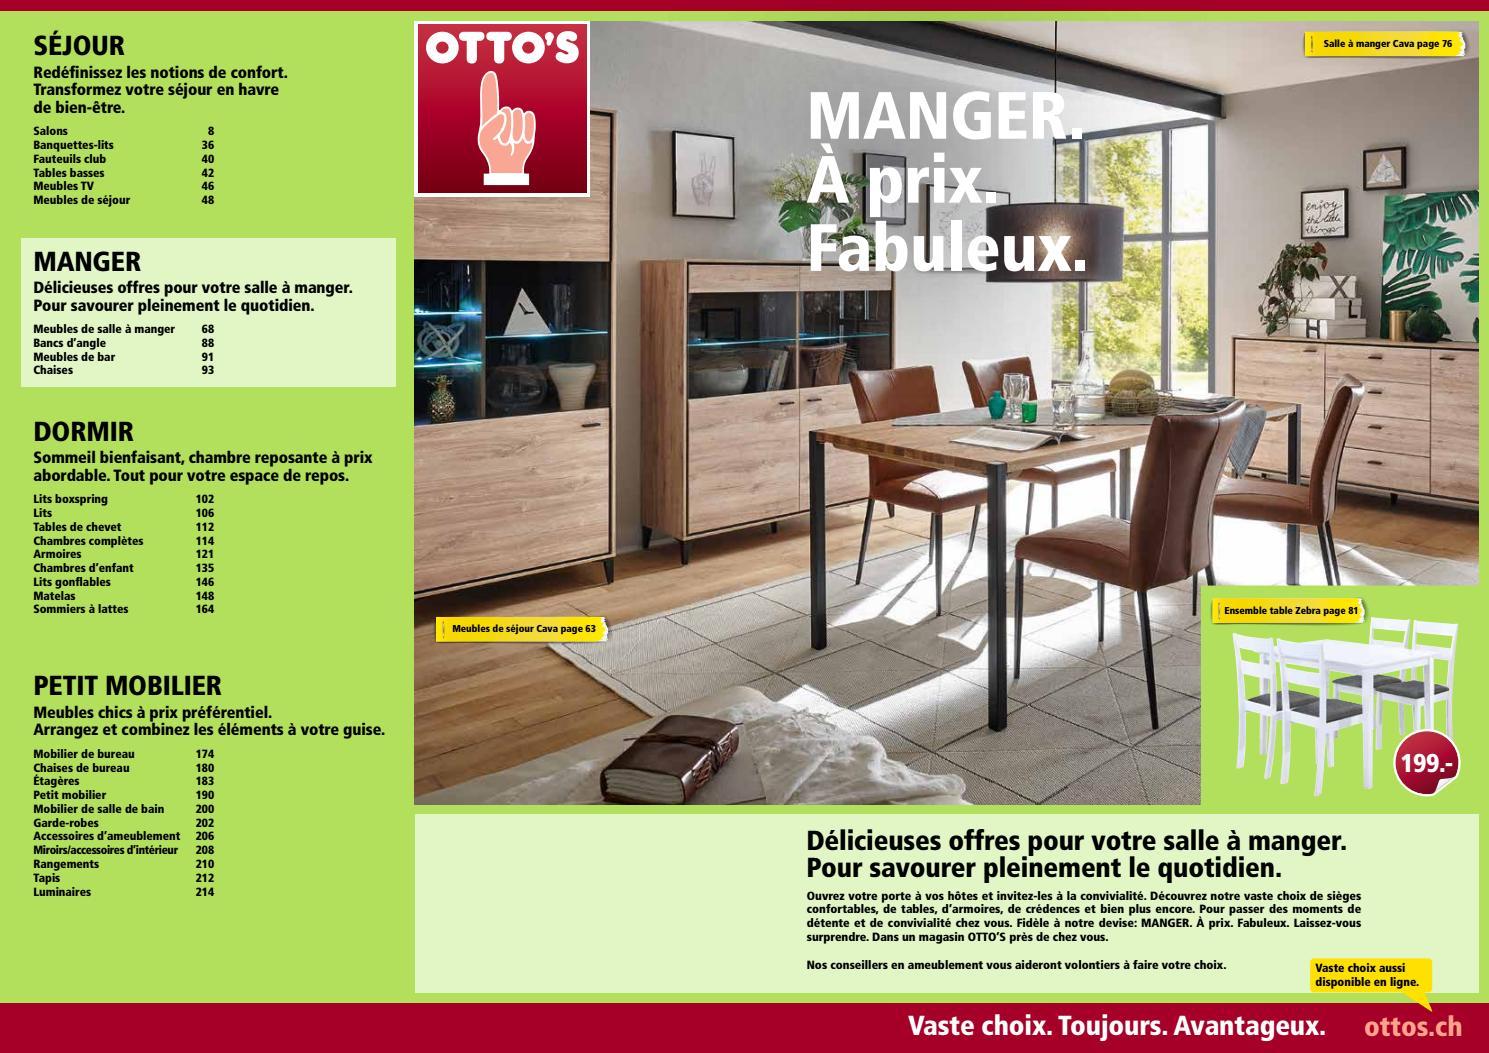 Mflyer 20160913 essen fr by otto 39 s ag issuu for Otto s yverdon meubles